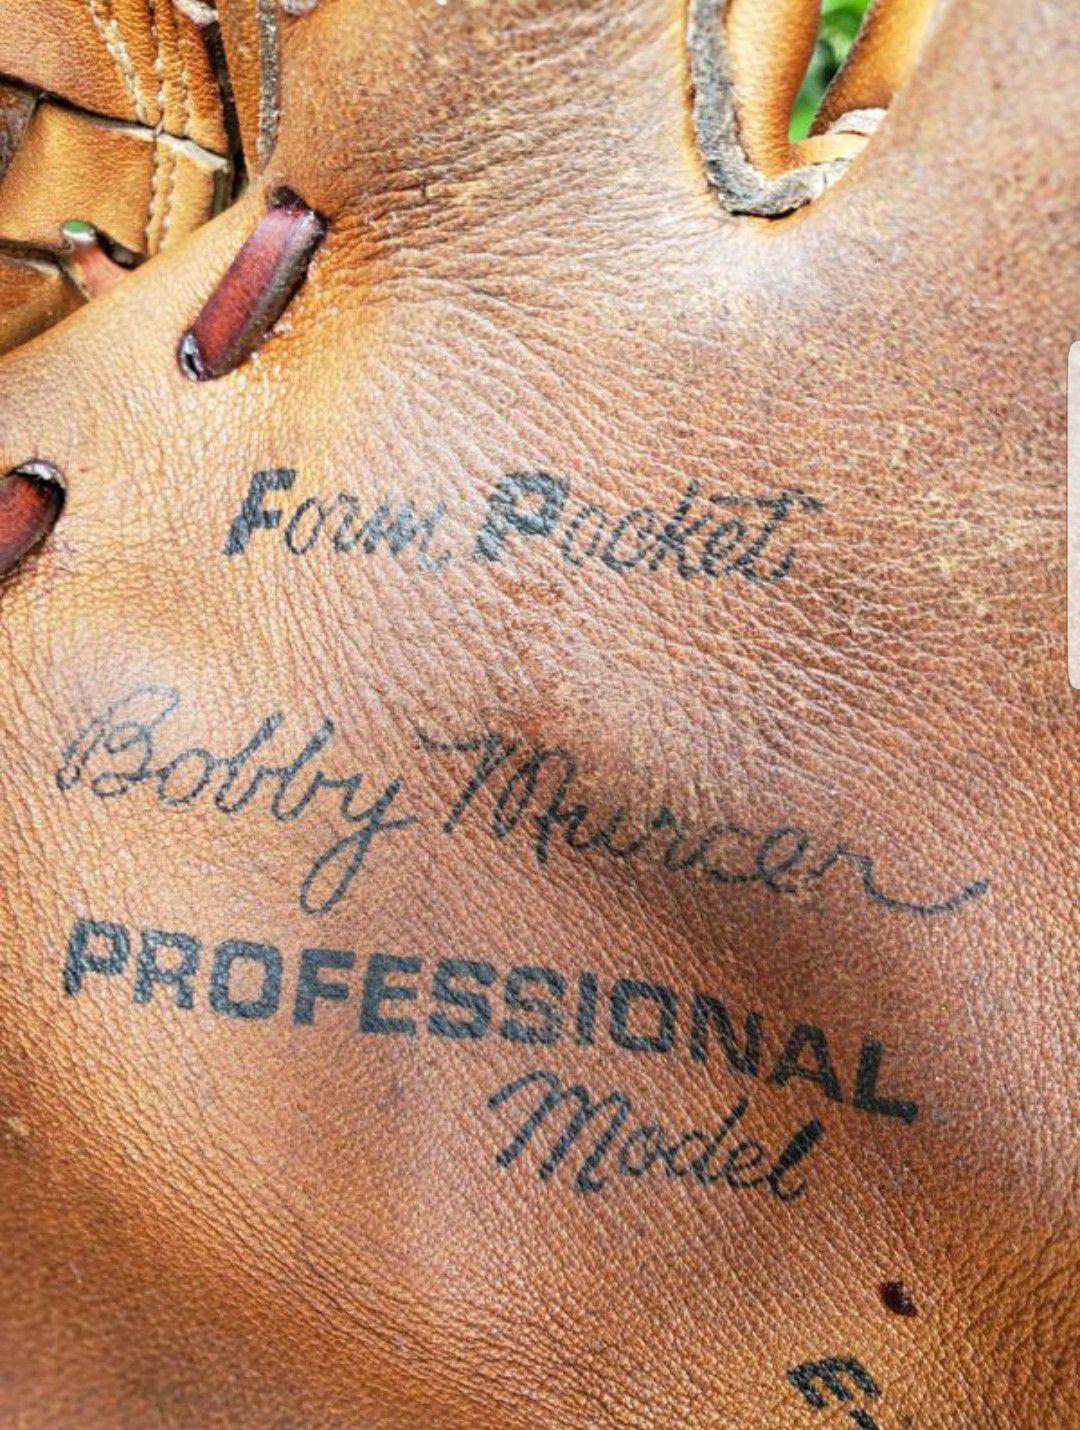 SPALDING BOBBY MURCER SIGNATURE BASEBALL GLOVE #42-3361 PROFESSIONAL MODEL